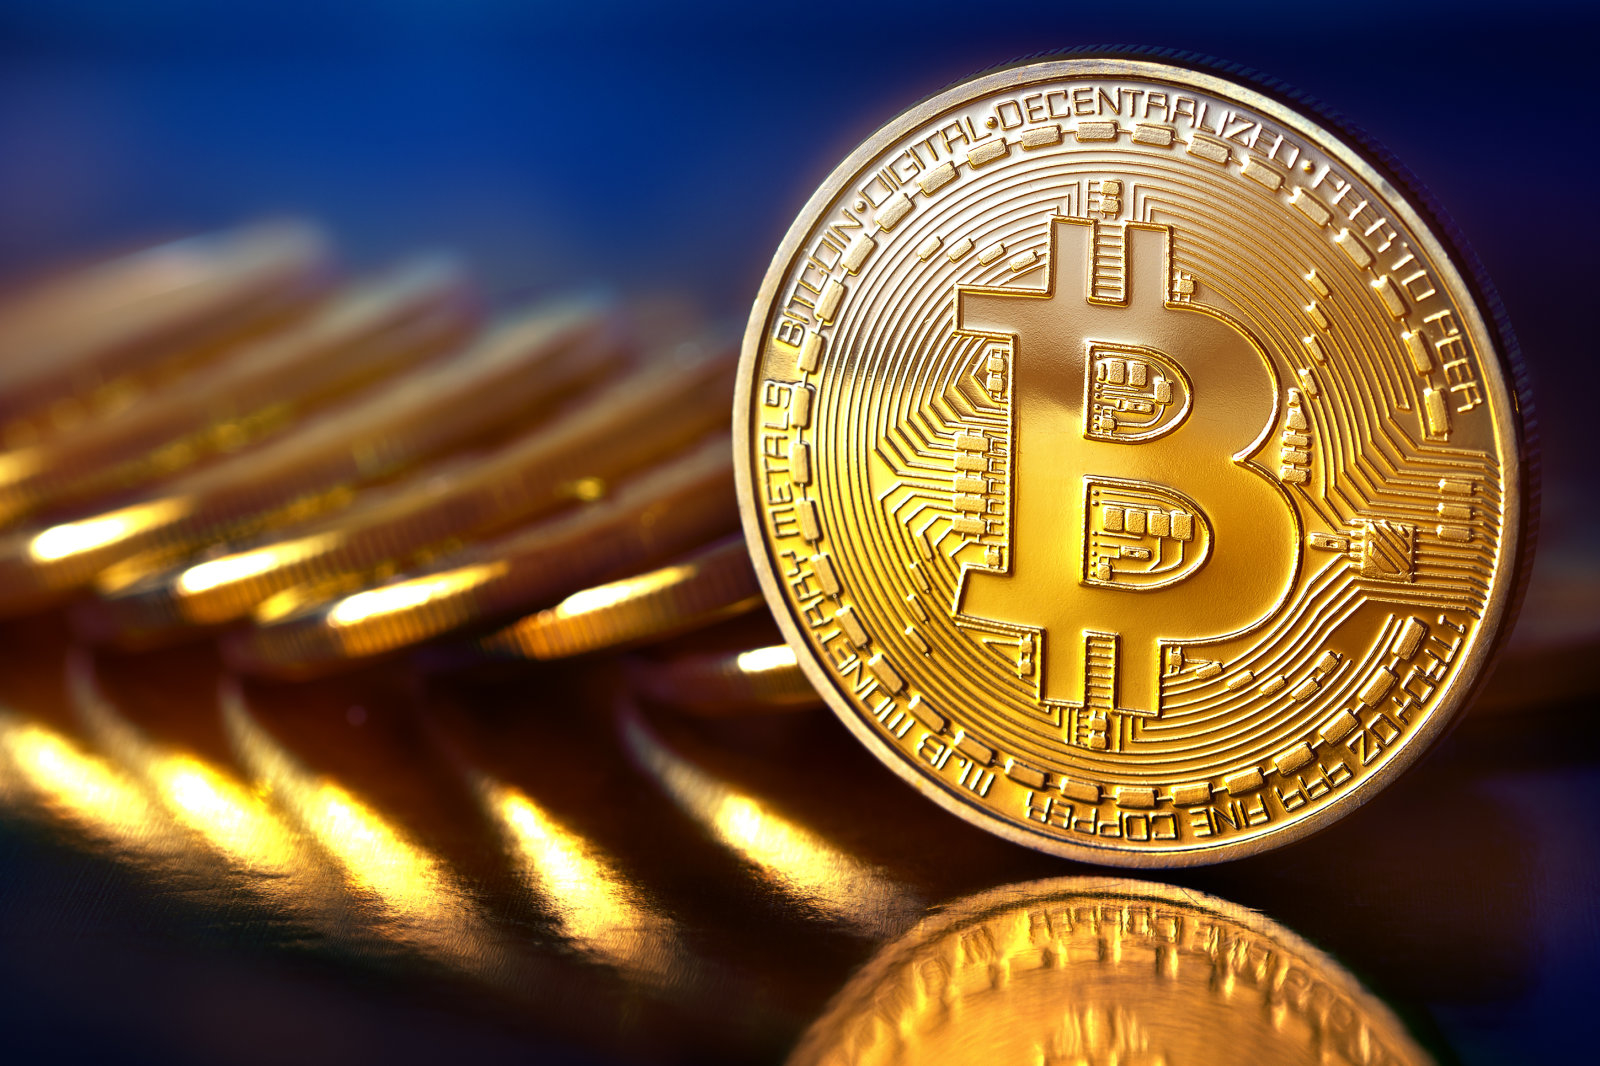 Prague, Czech Republic - January 1, 2000: Photo Golden Bitcoins (new virtual money ) Close-up on a blue background.